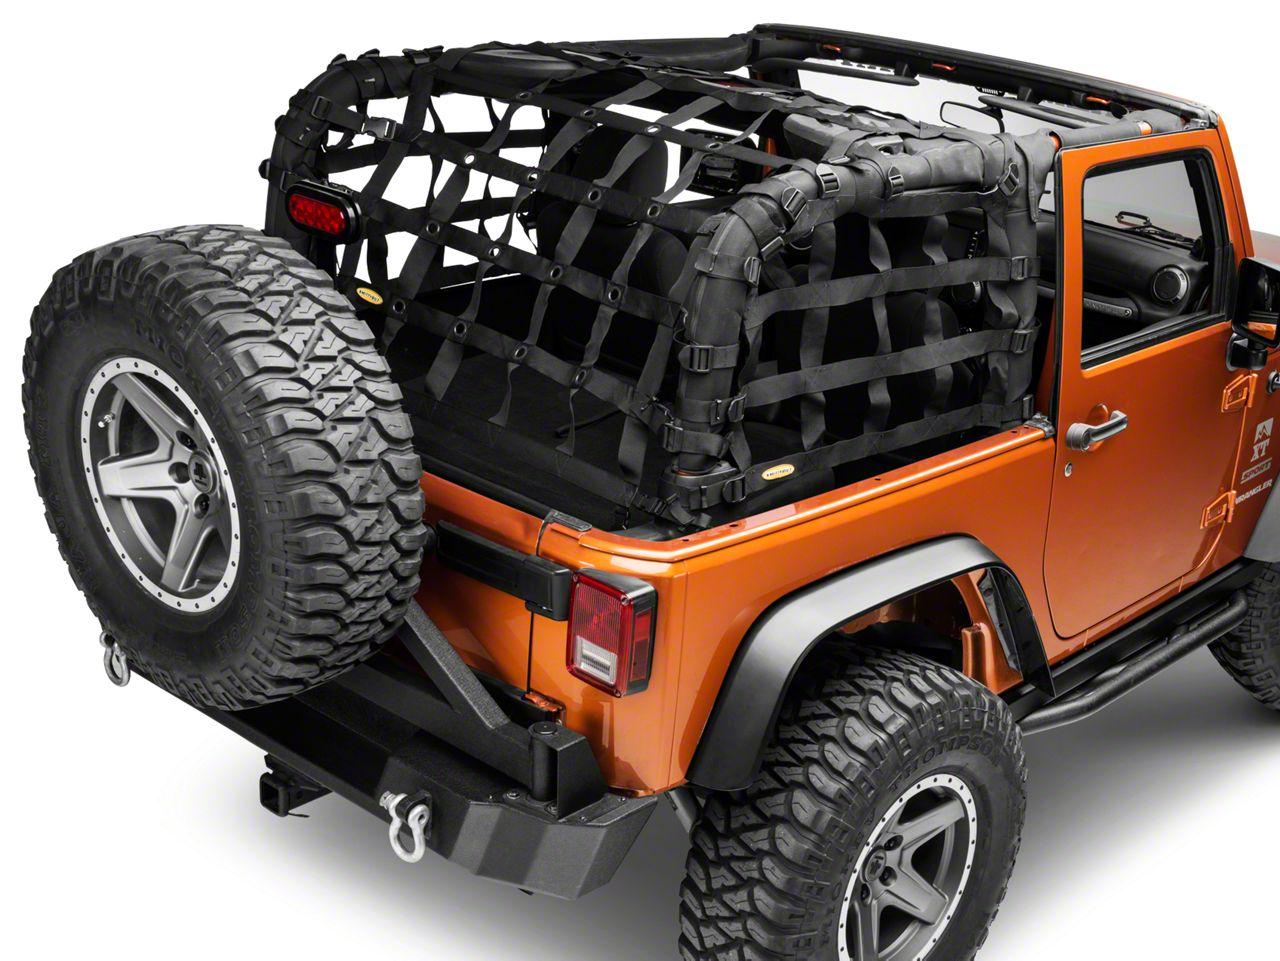 Smittybilt C-RES2 Cargo Restraint System (07-18 Jeep Wrangler JK)